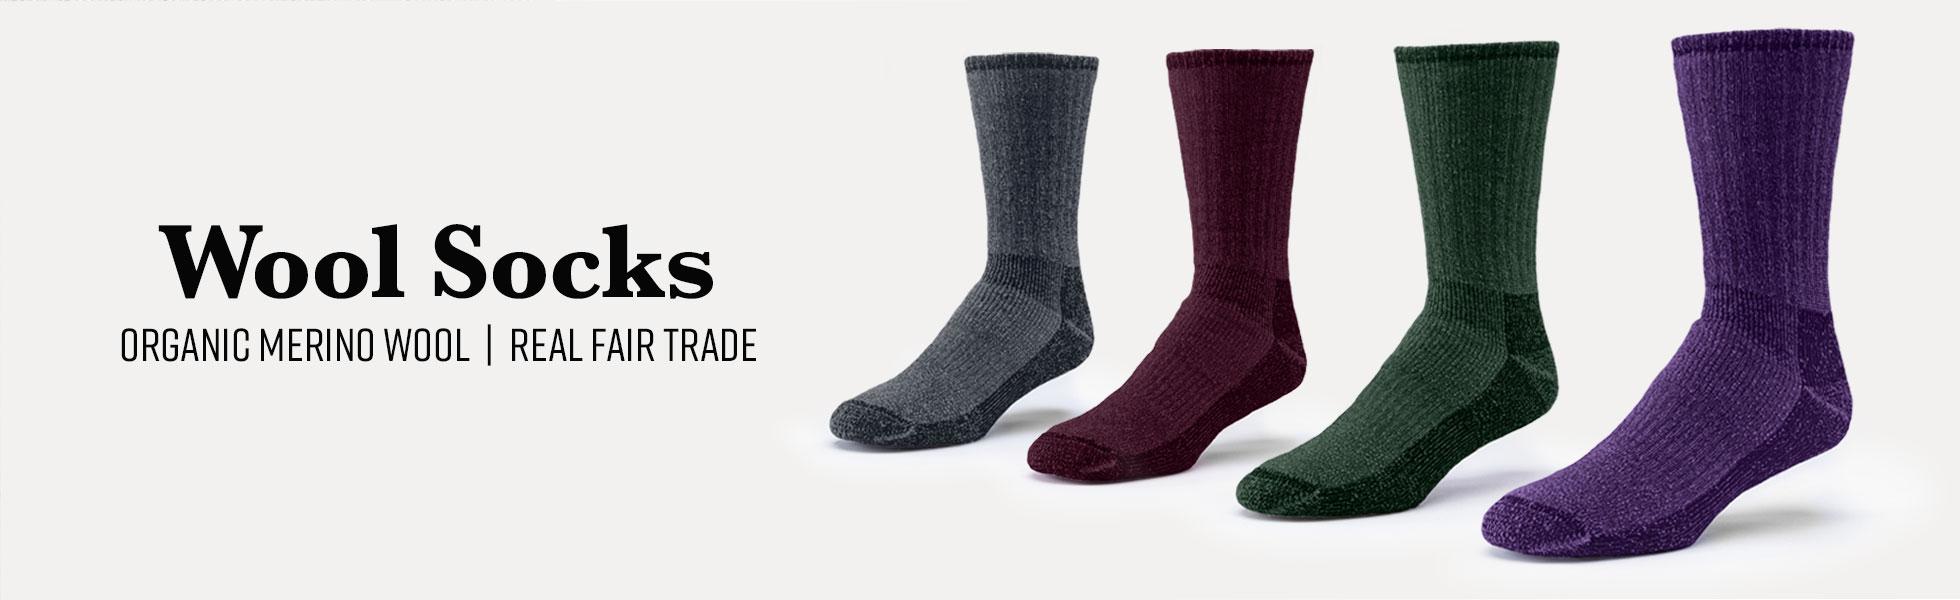 Organic Cotton Merino Wool Socks